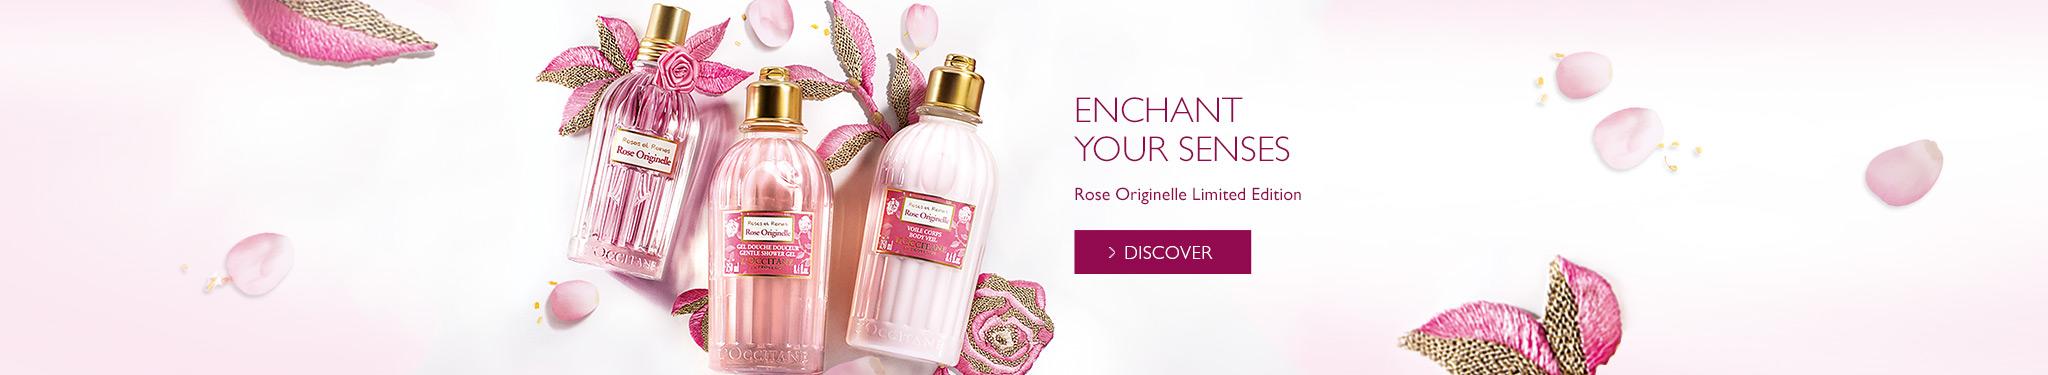 Enchant your senses with rose originelle